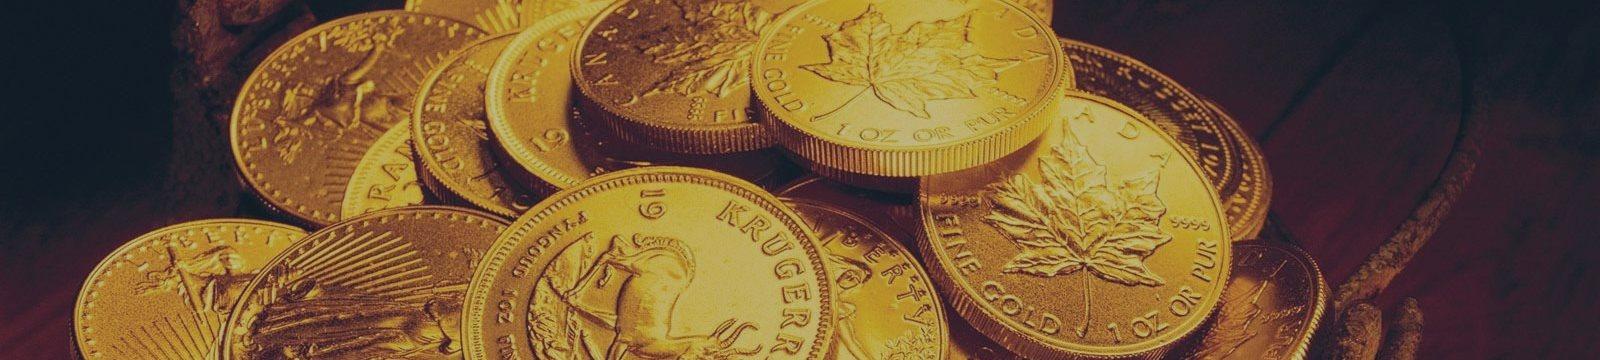 Oro Análisis Fundamental 19 Septiembre 2014, Pronóstico